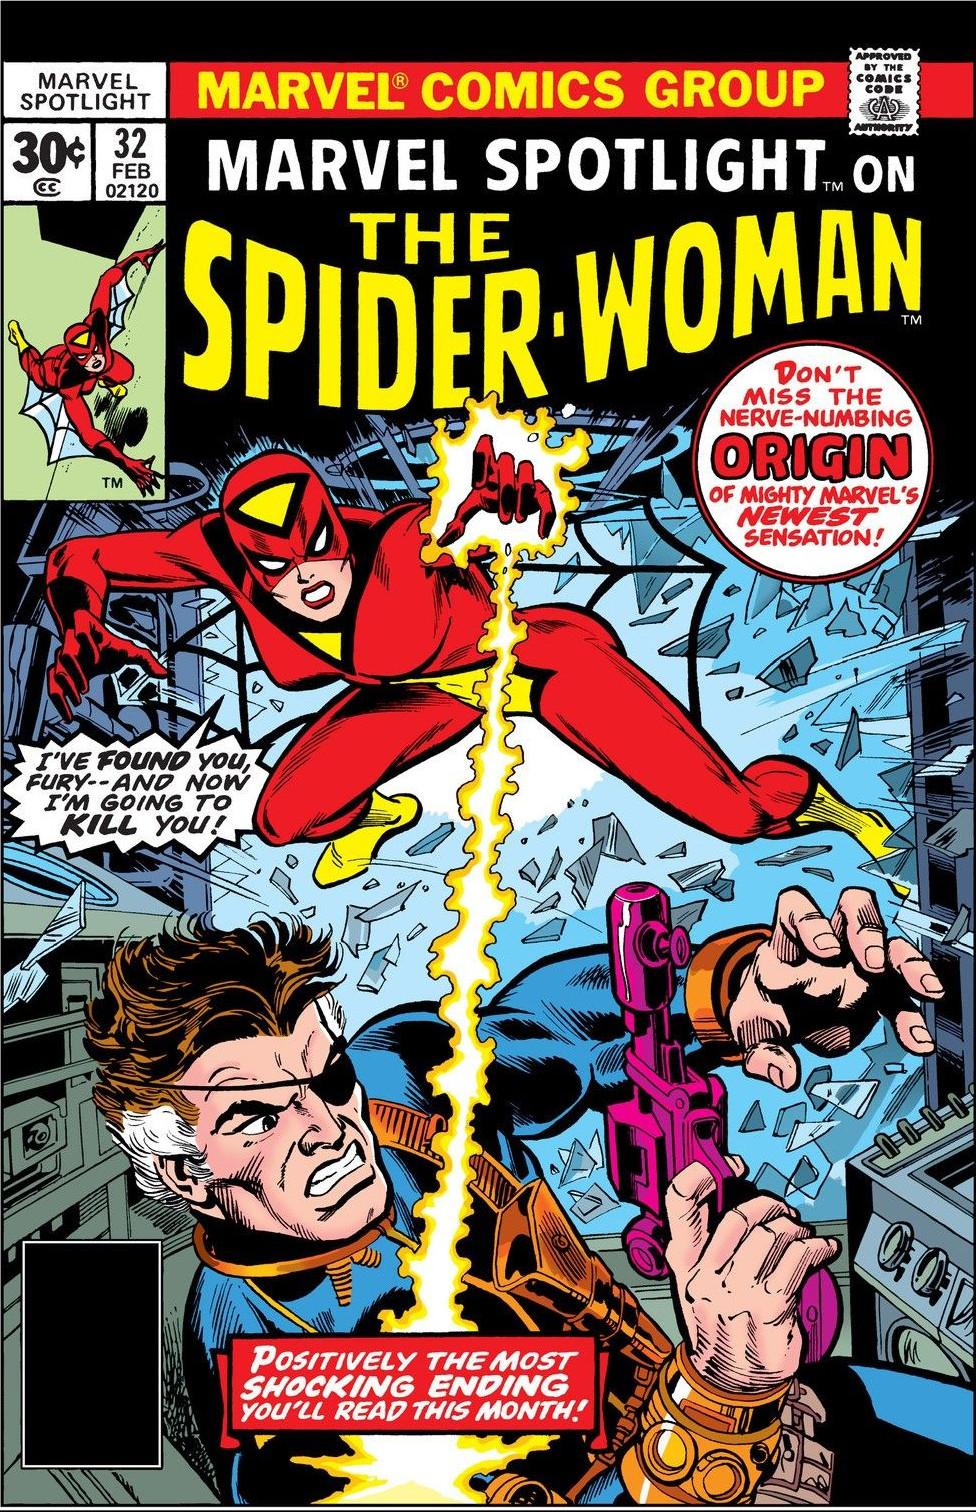 32 Best Images About Cgh On Pinterest: Marvel Spotlight Vol 1 32